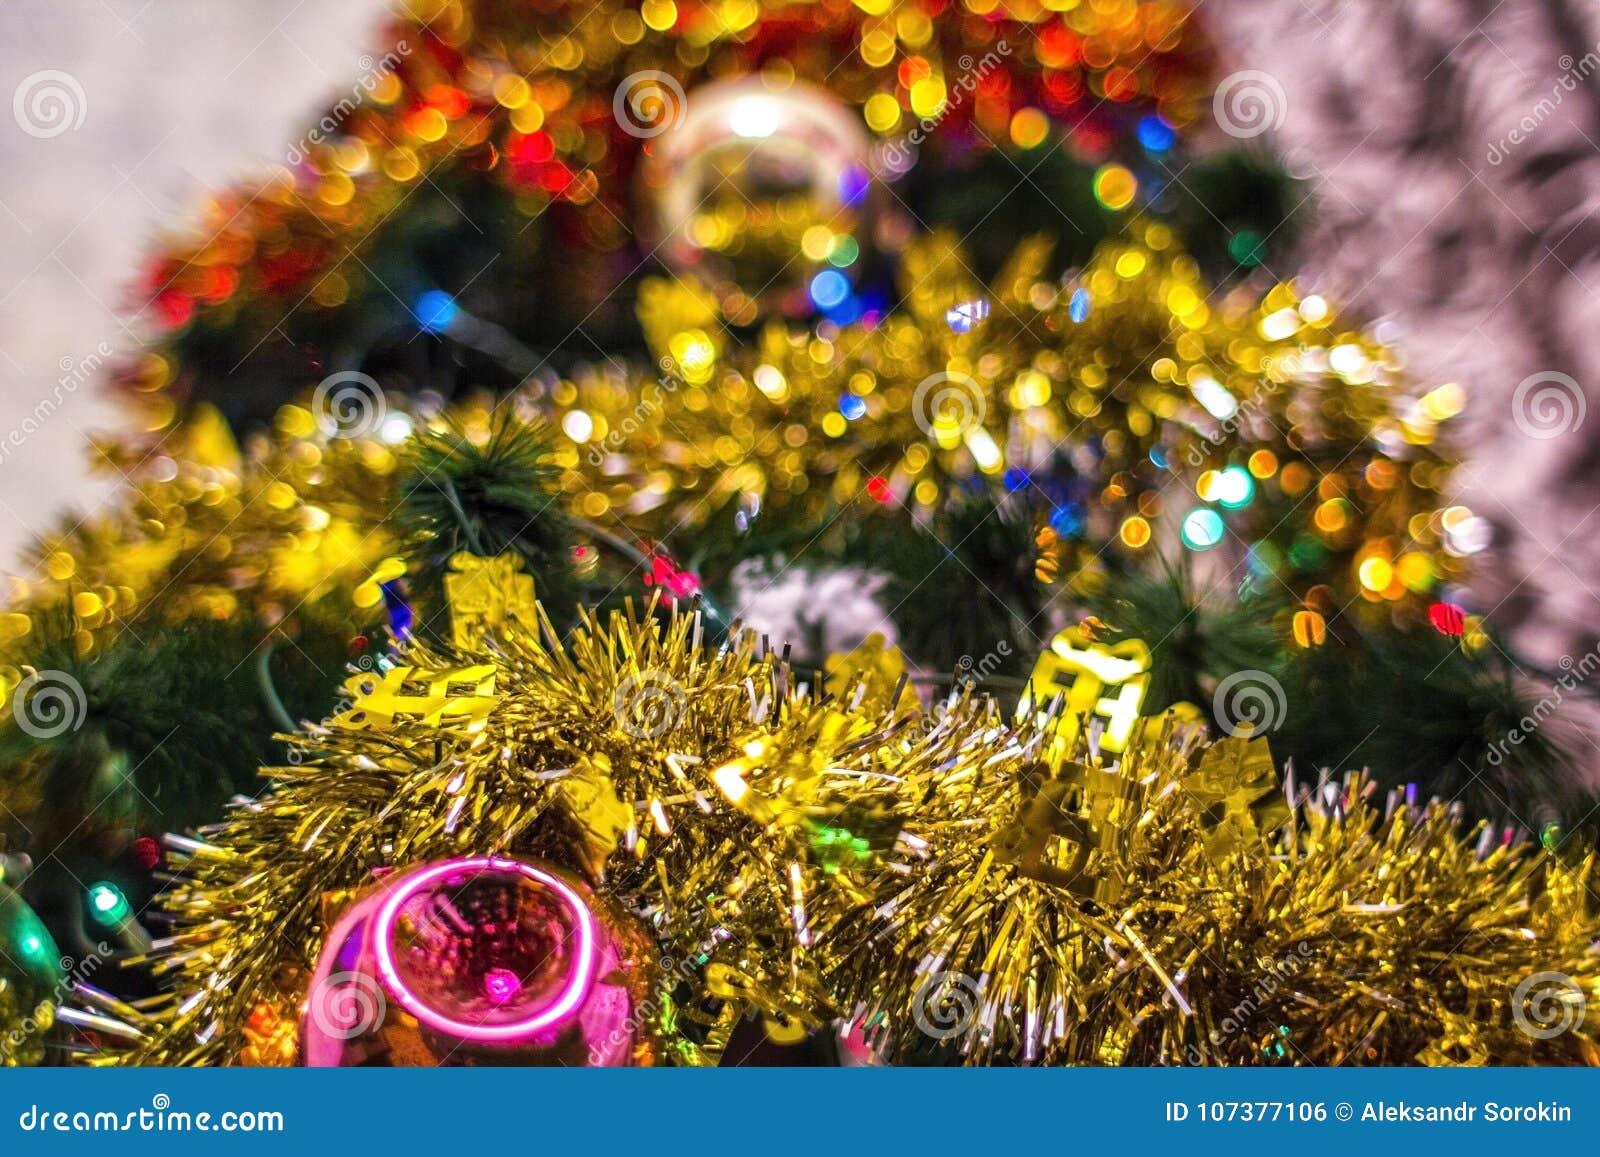 Magic Beautiful Christmas Tree With Old Fashioned, Retro Christmas ...